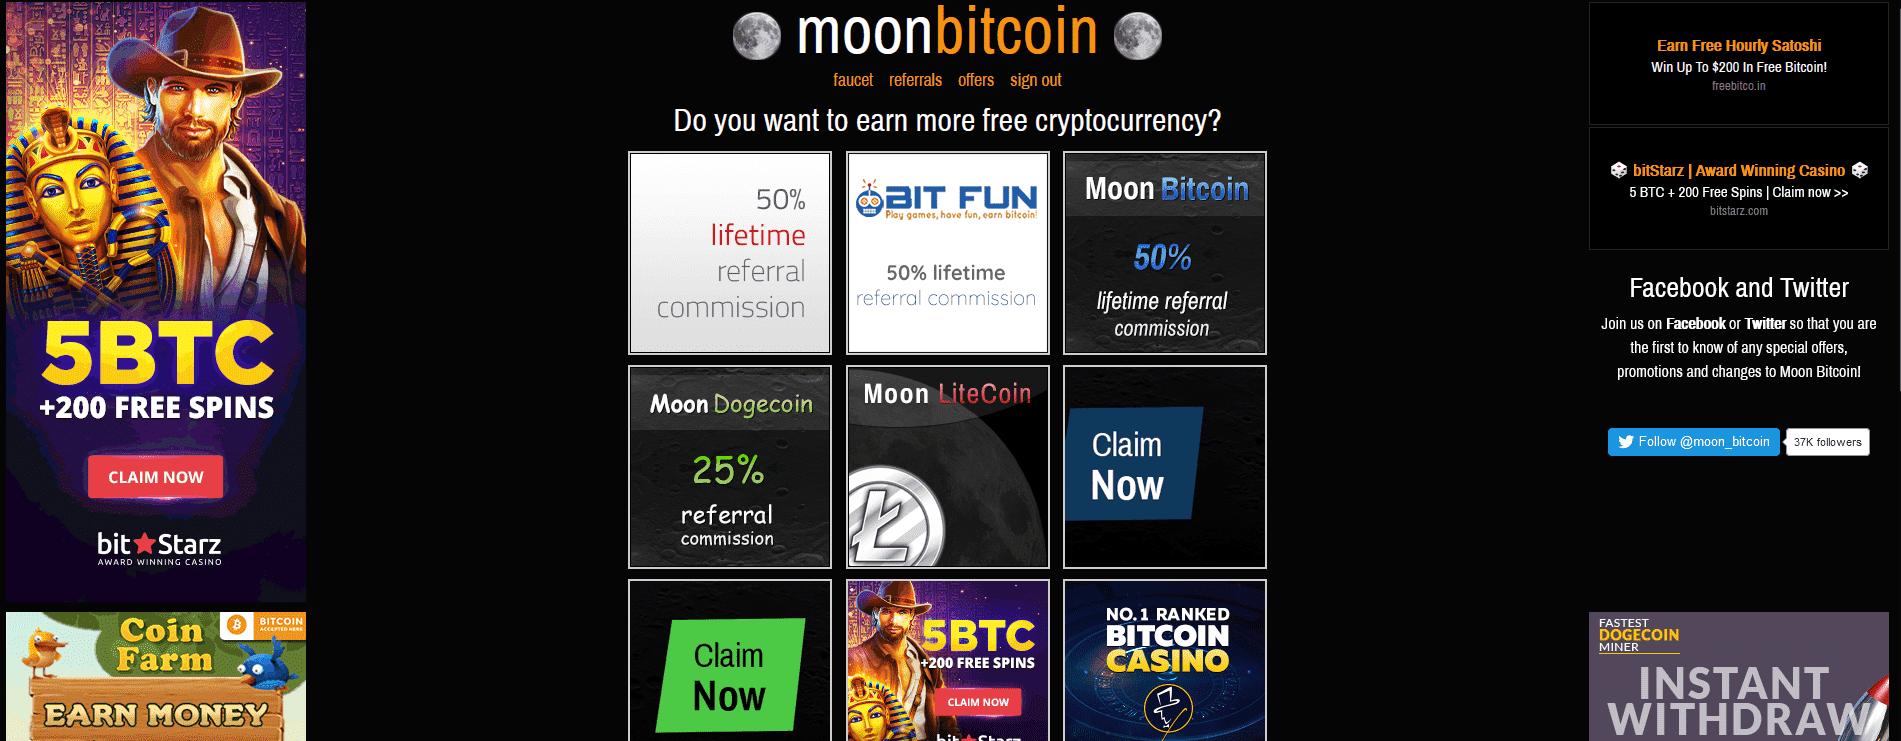 Moon Bitcoin Test